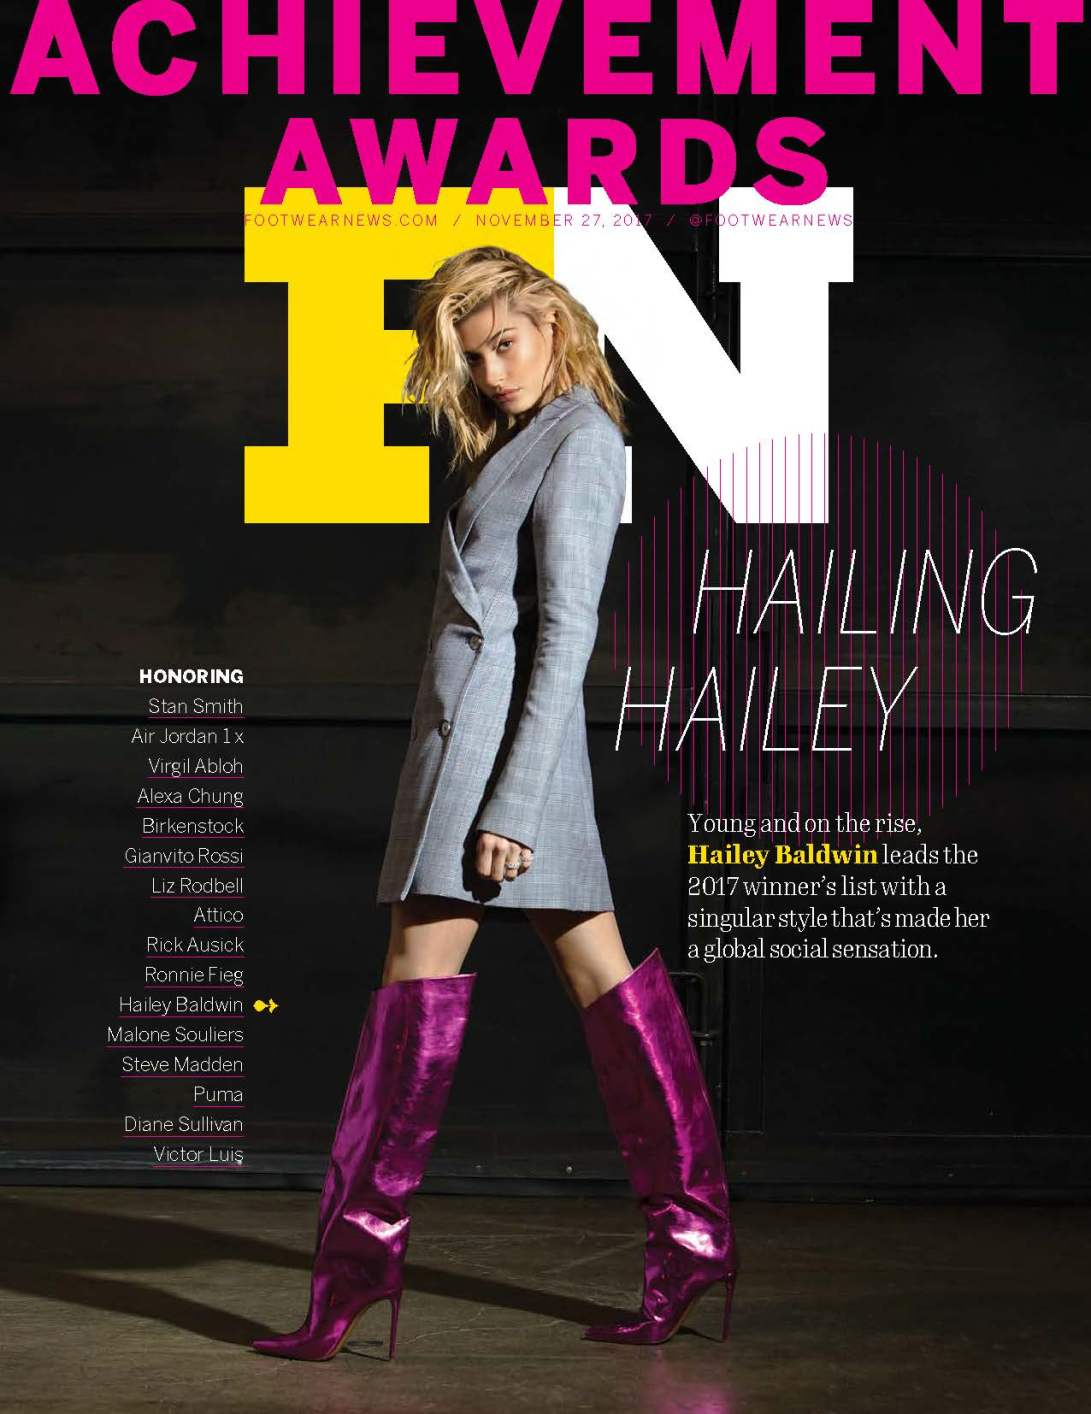 nia groce, footwear news, hailey baldwin